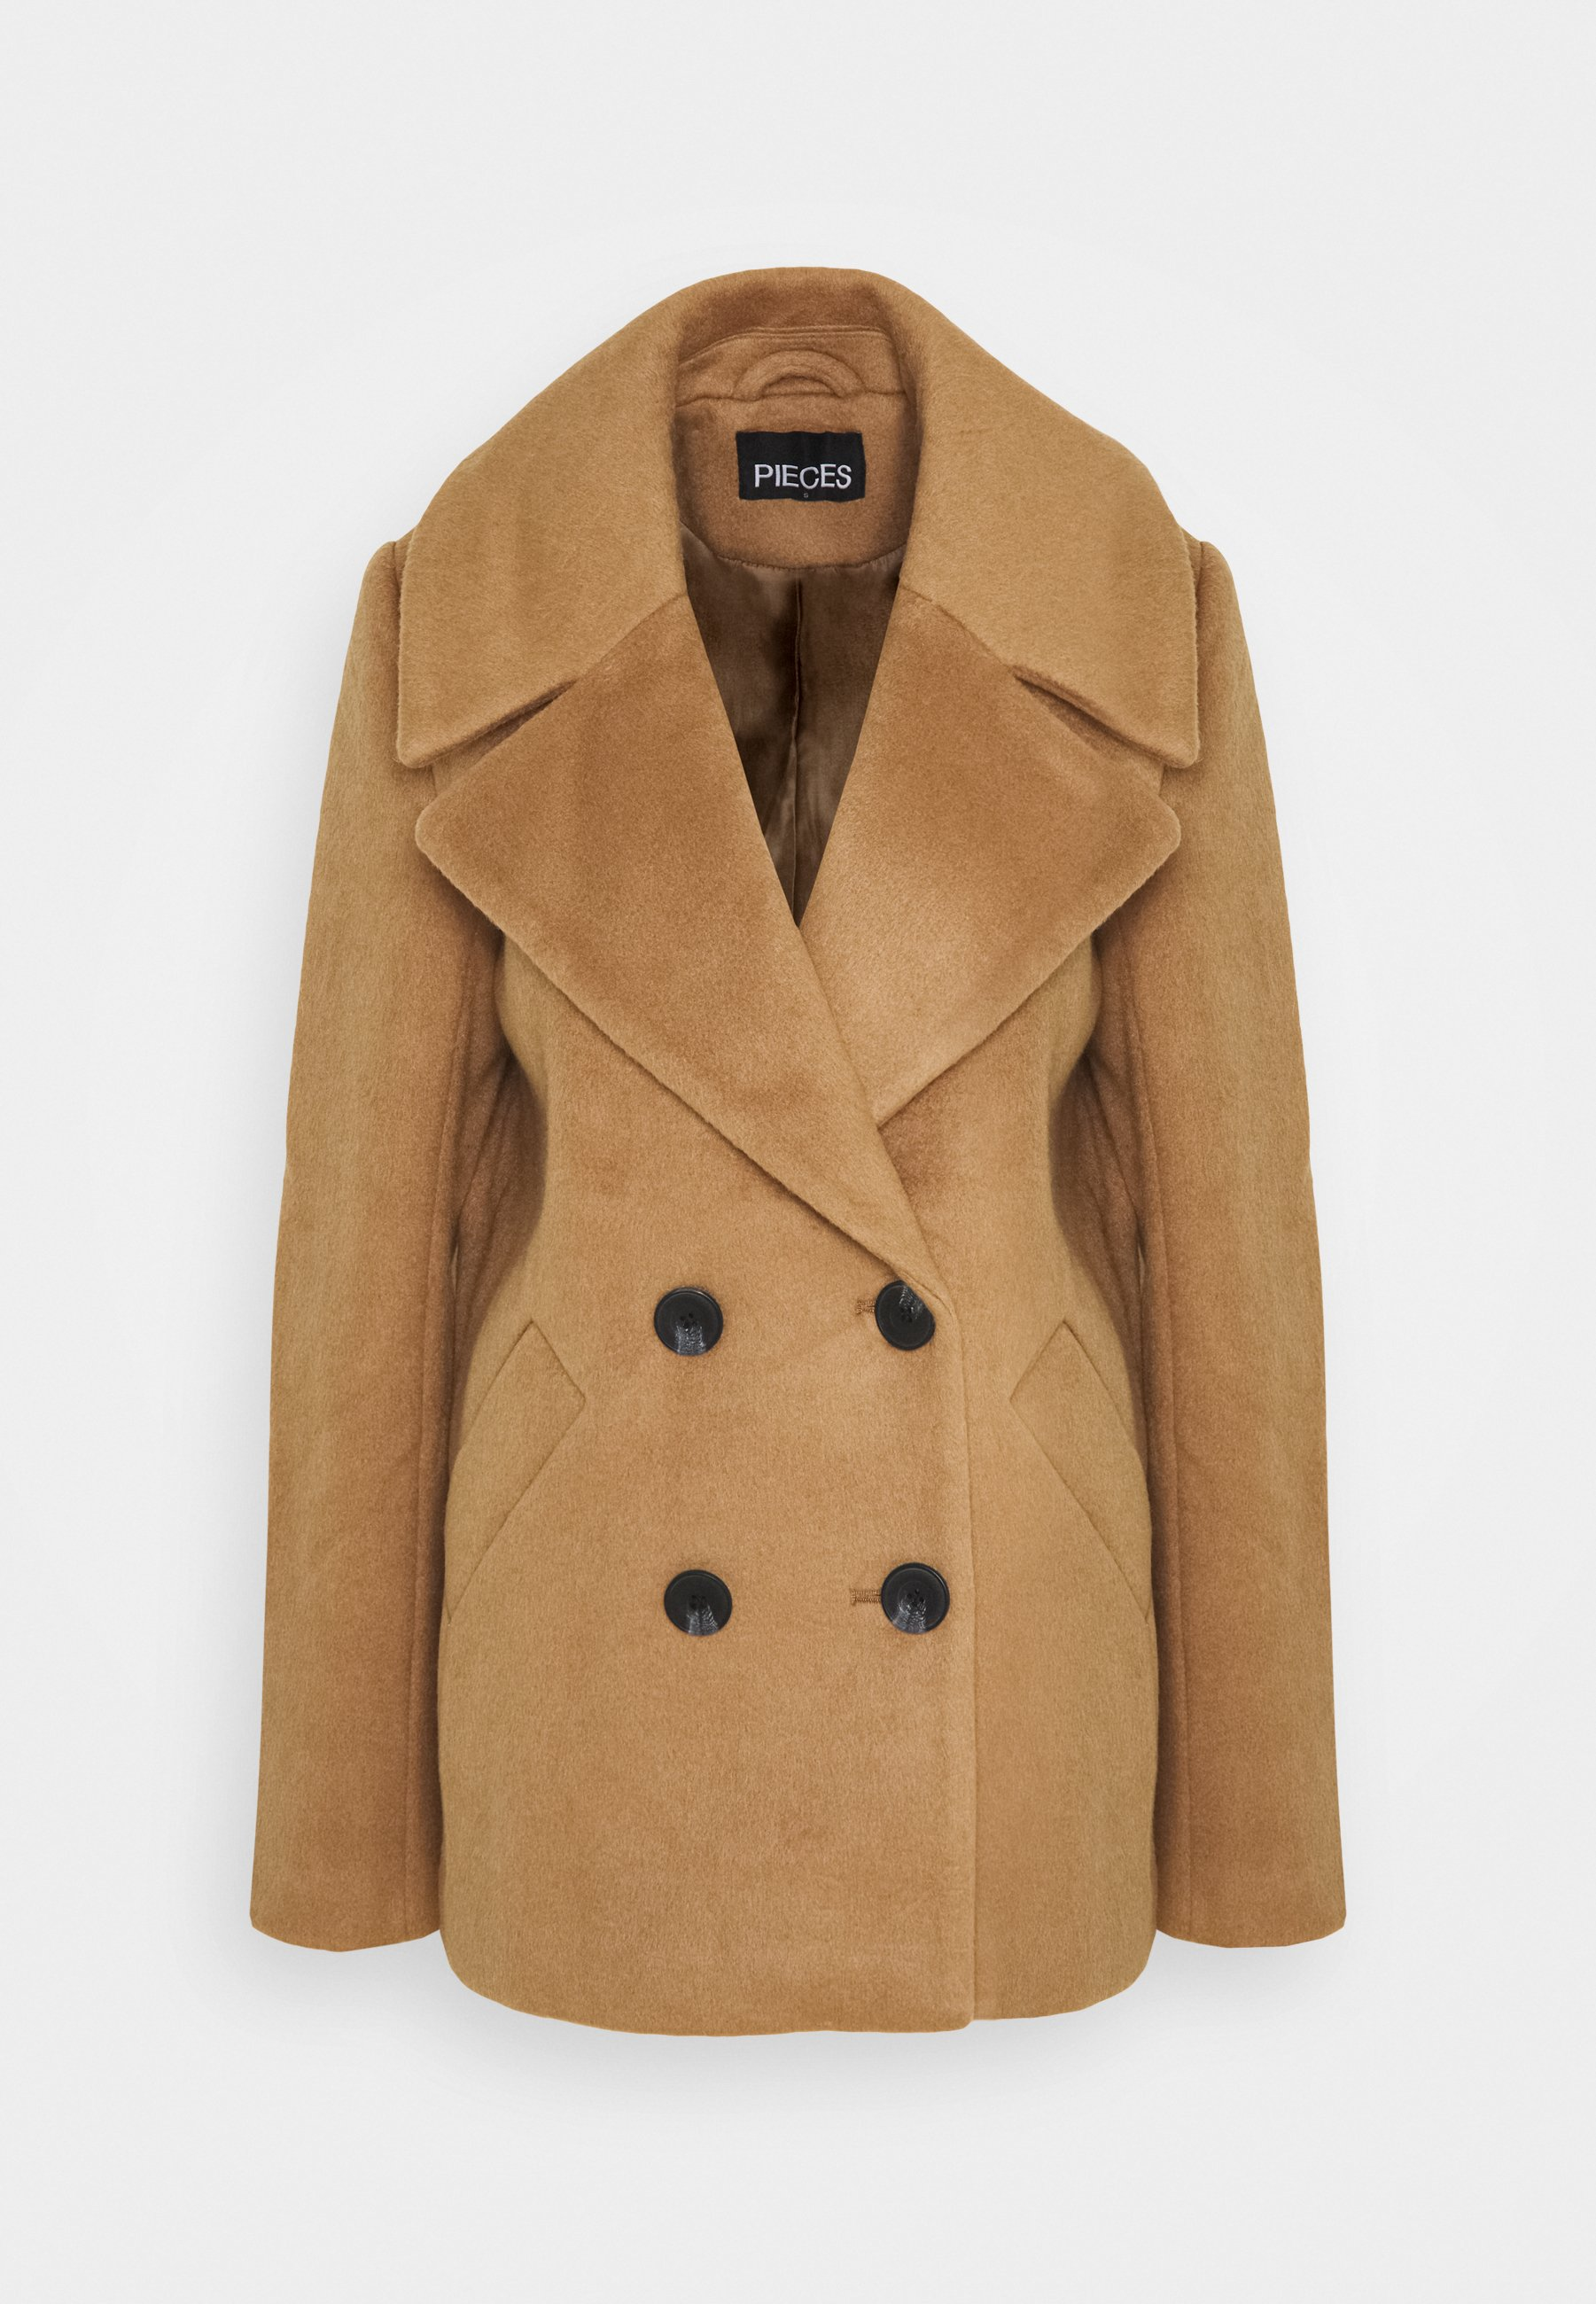 Bruine winterjassen online kopen | Fashionchick.nl